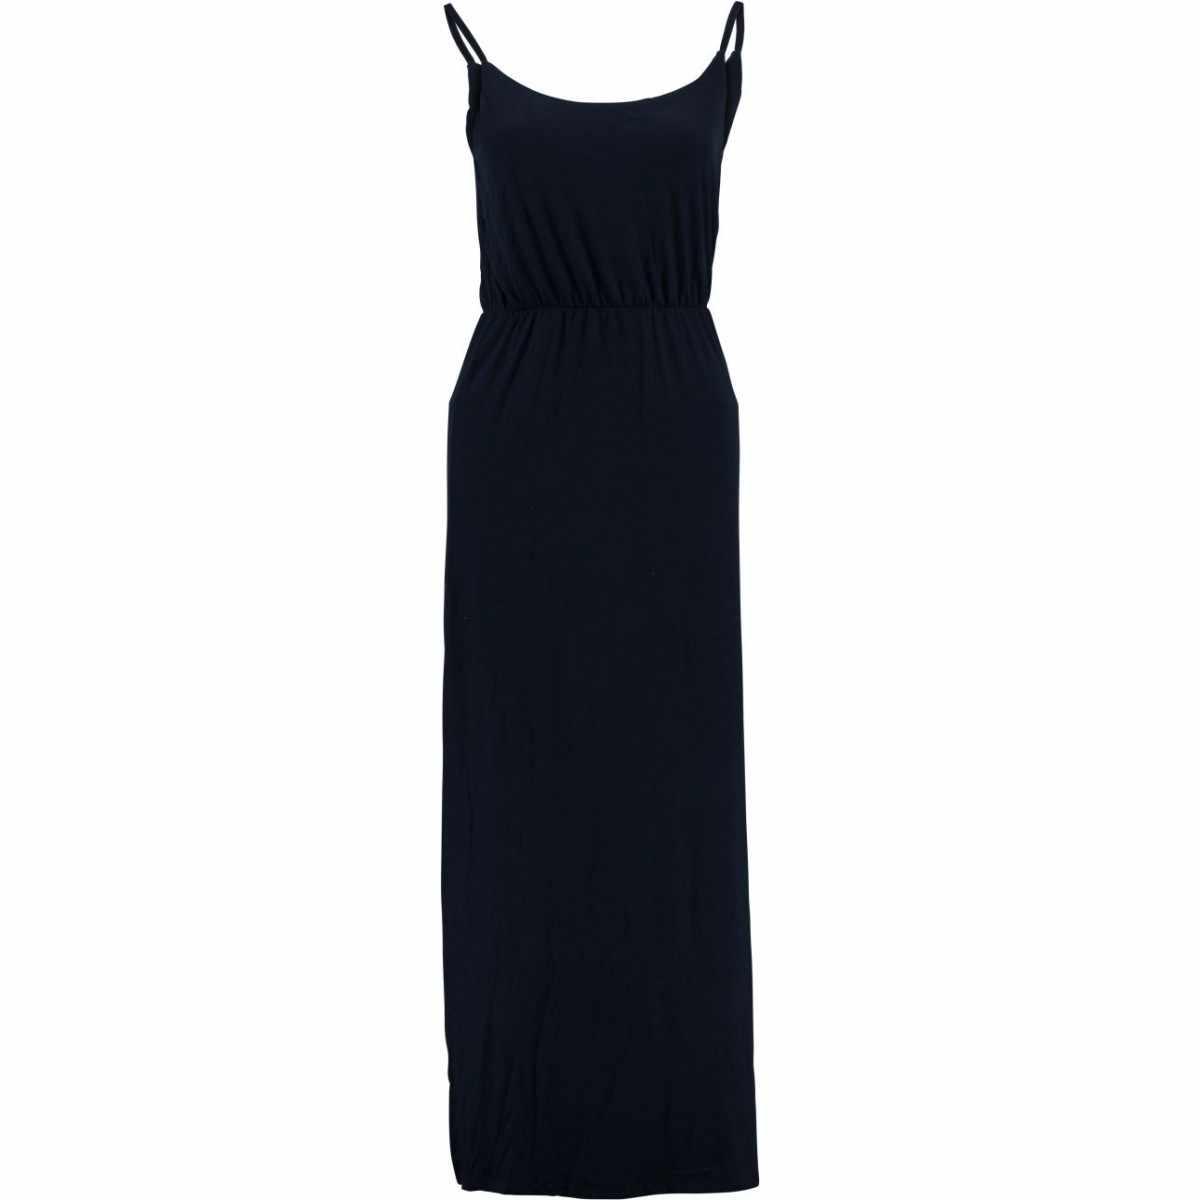 fa2ffffc4f68 Hailys dámské maxi šaty na ramínka Marcy modré - Glami.cz